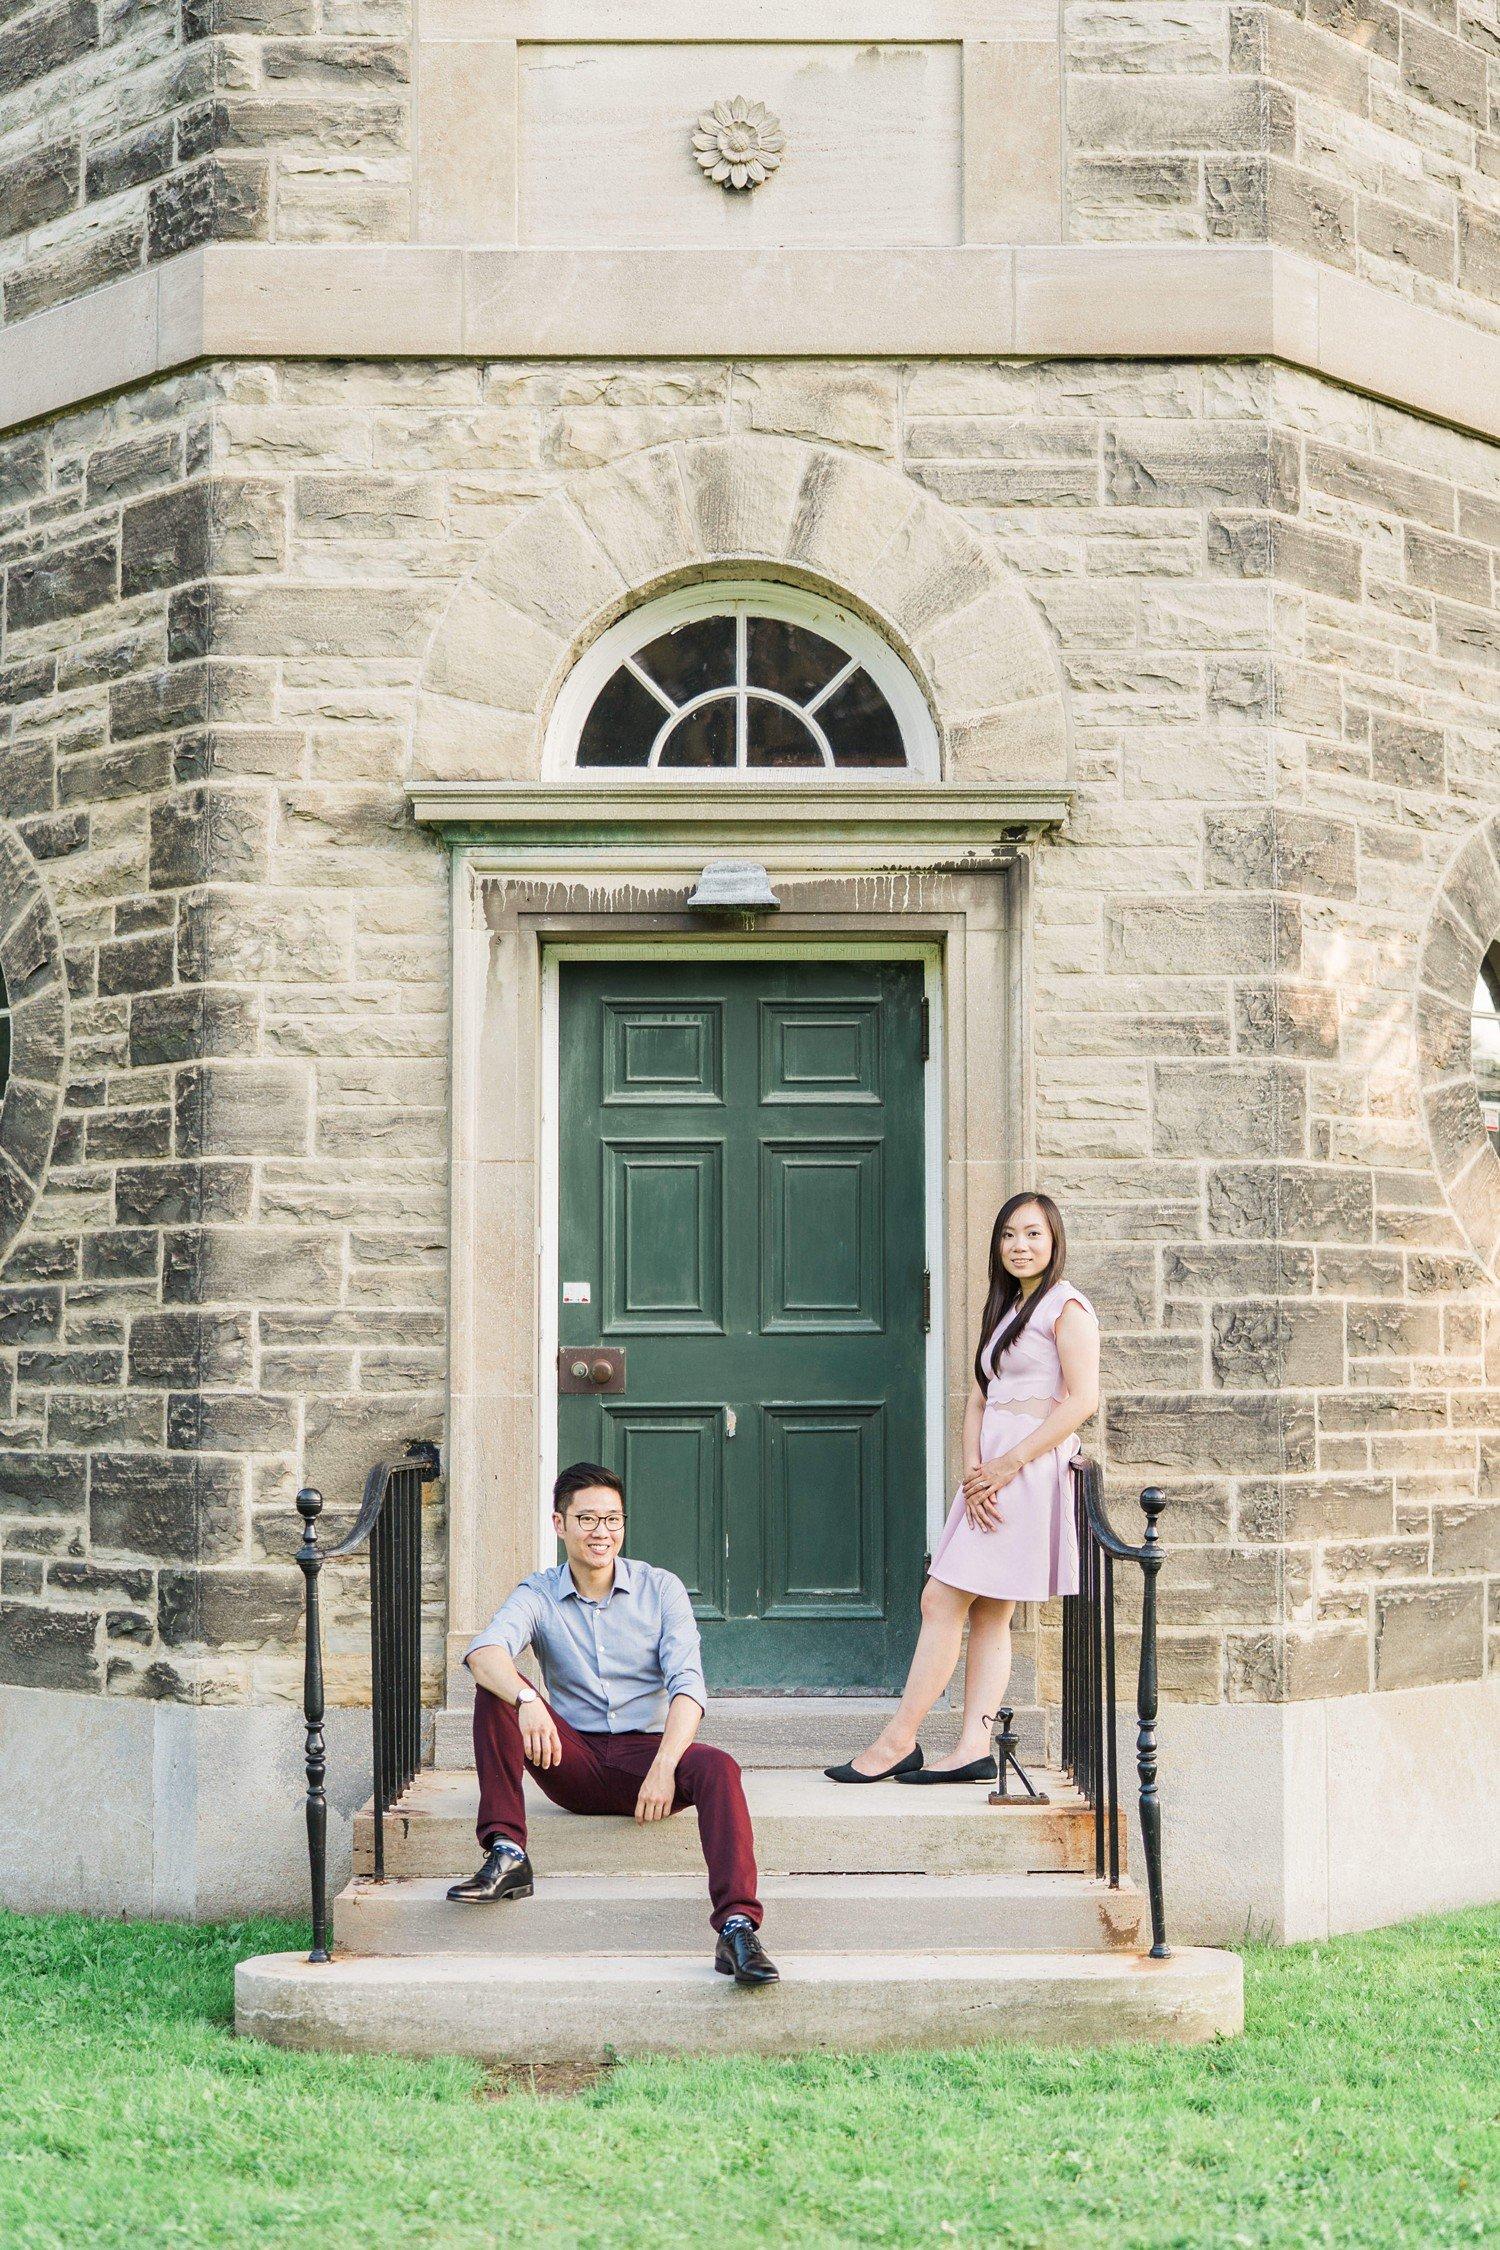 David_Dunlap_Observatory_Destination_Engagement_Photos_Toronto-Rhythm_Photography